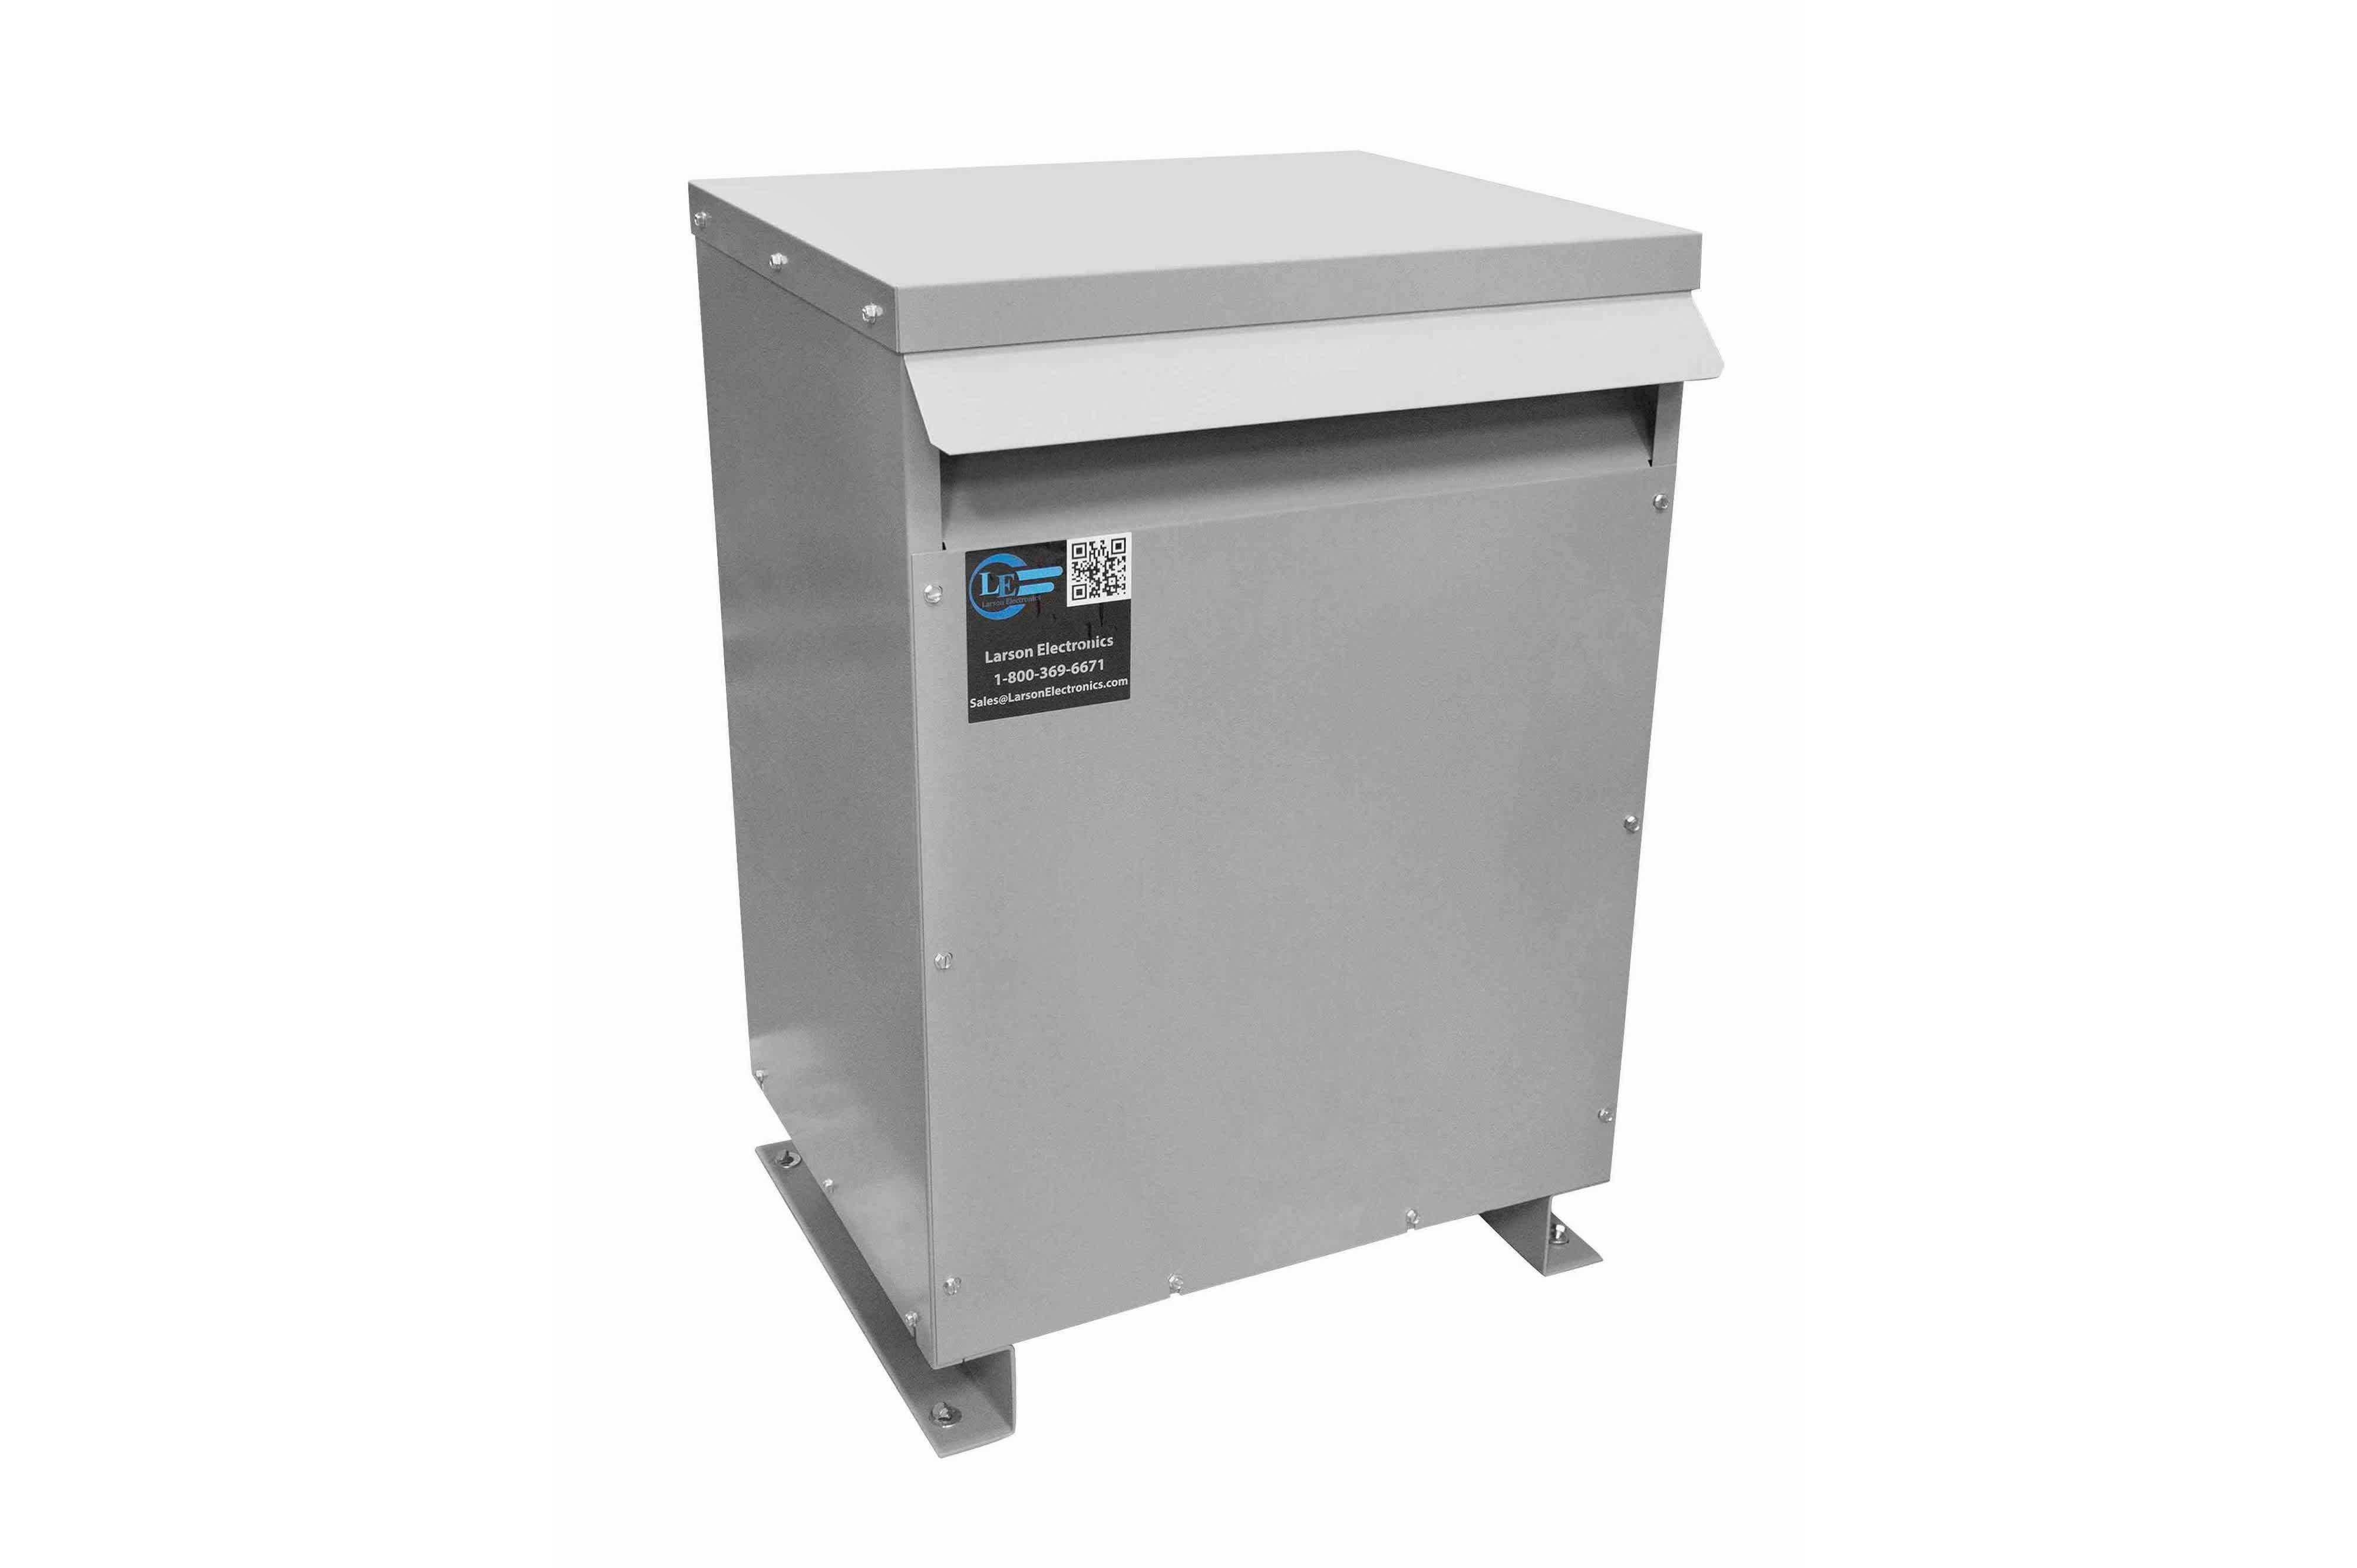 600 kVA 3PH Isolation Transformer, 480V Wye Primary, 480Y/277 Wye-N Secondary, N3R, Ventilated, 60 Hz